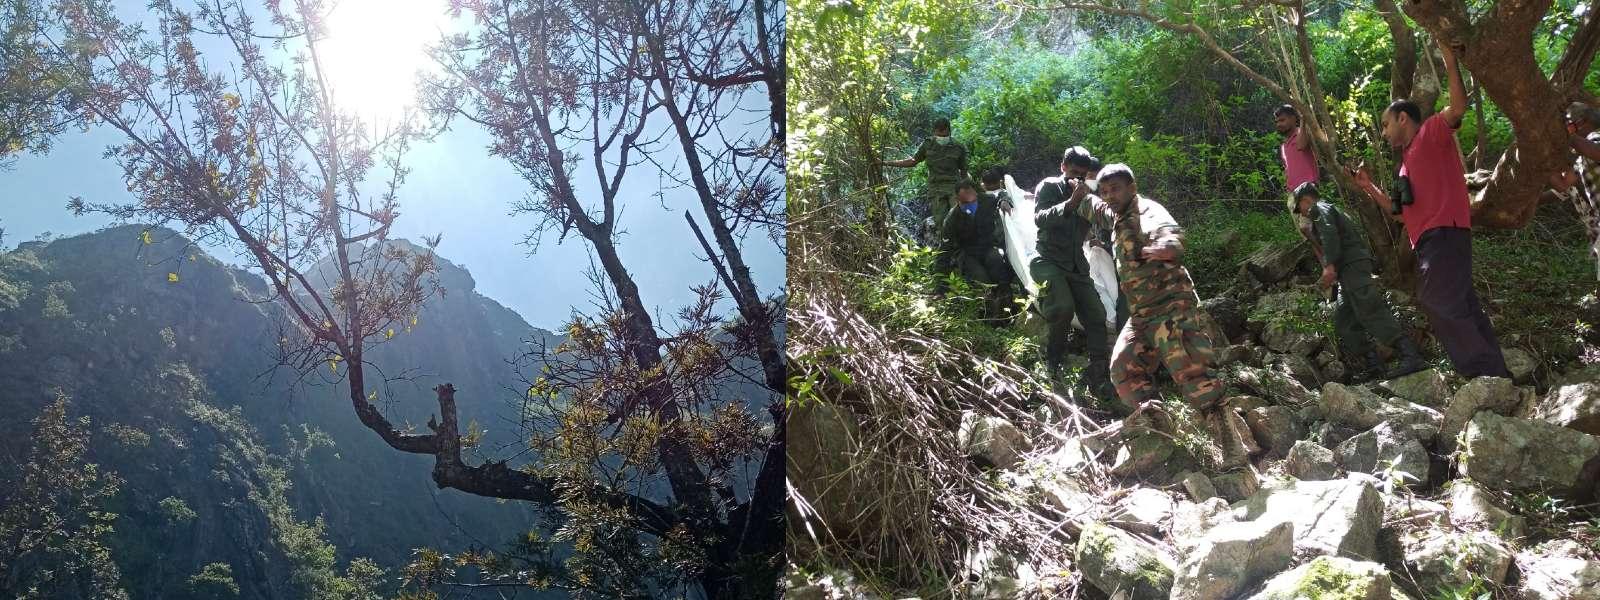 Remains of missing hiker found in Narangala Ridge